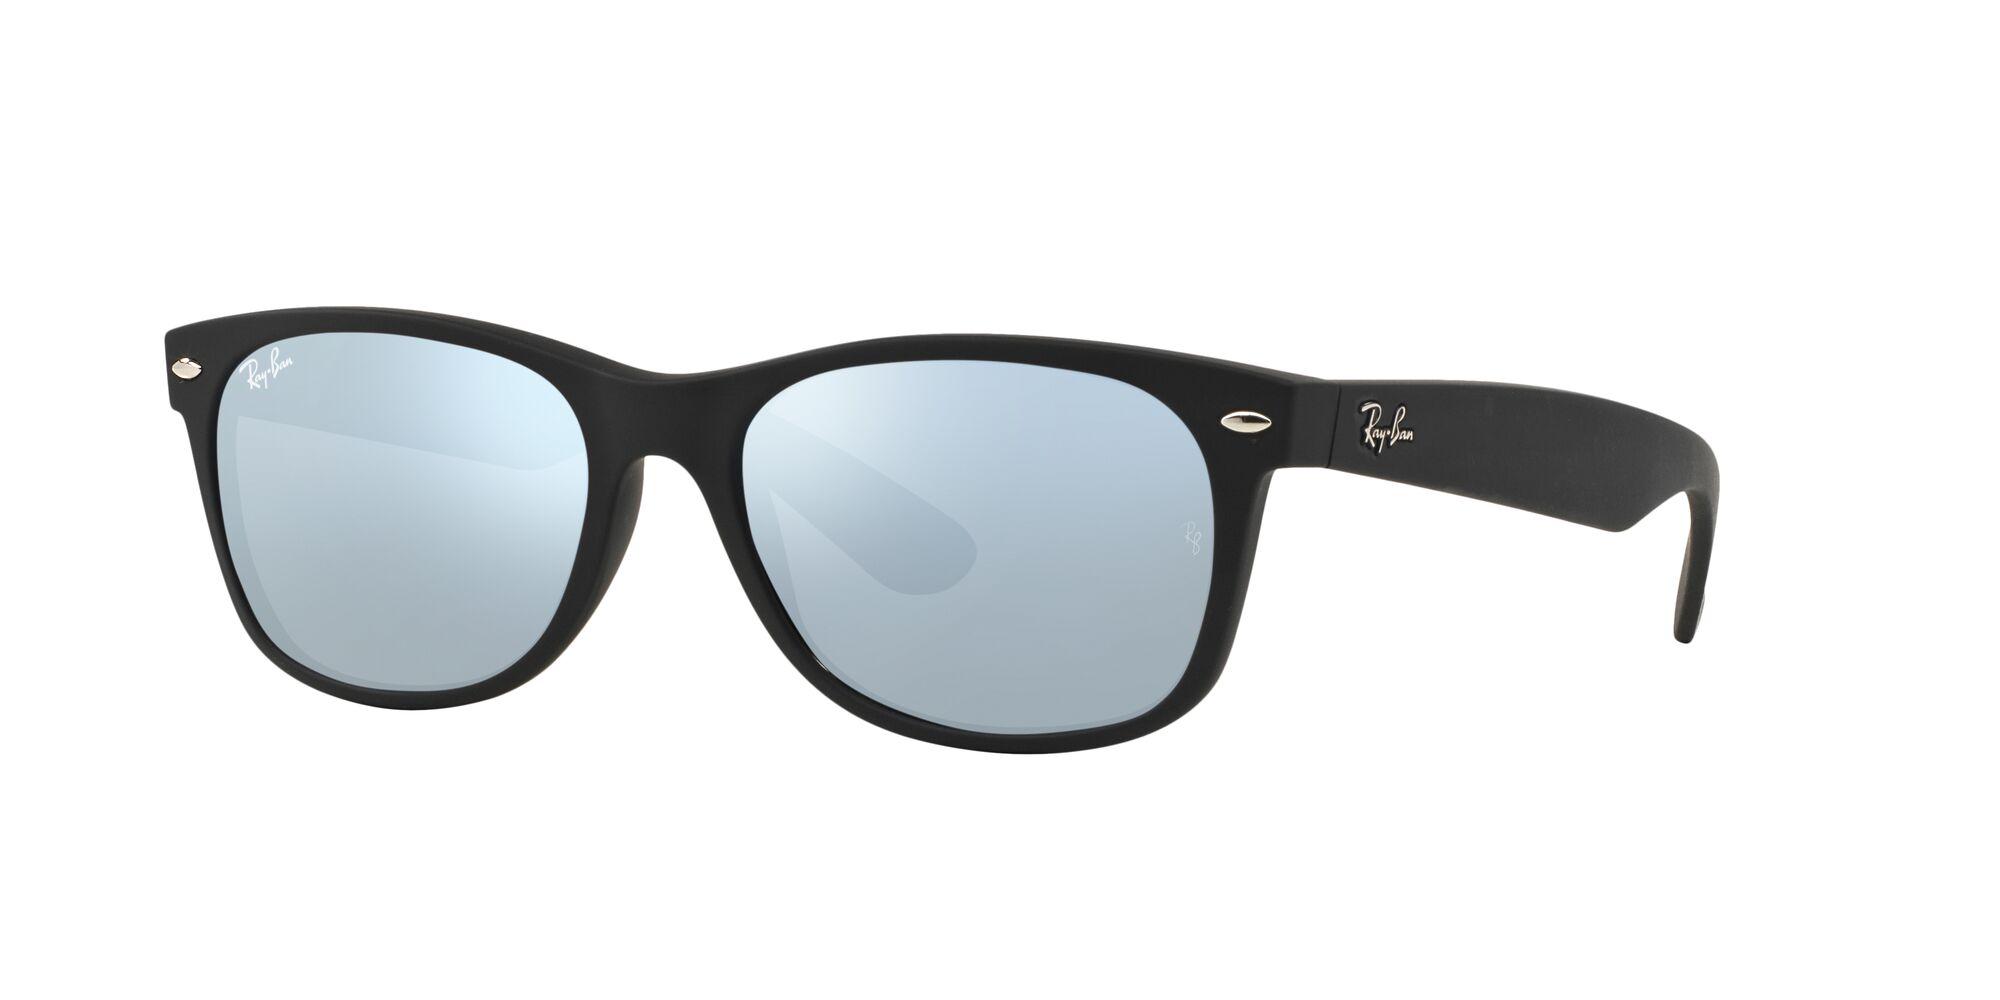 Ray-Ban Sunglasses Light Ray Titan RB-4242 6199/73